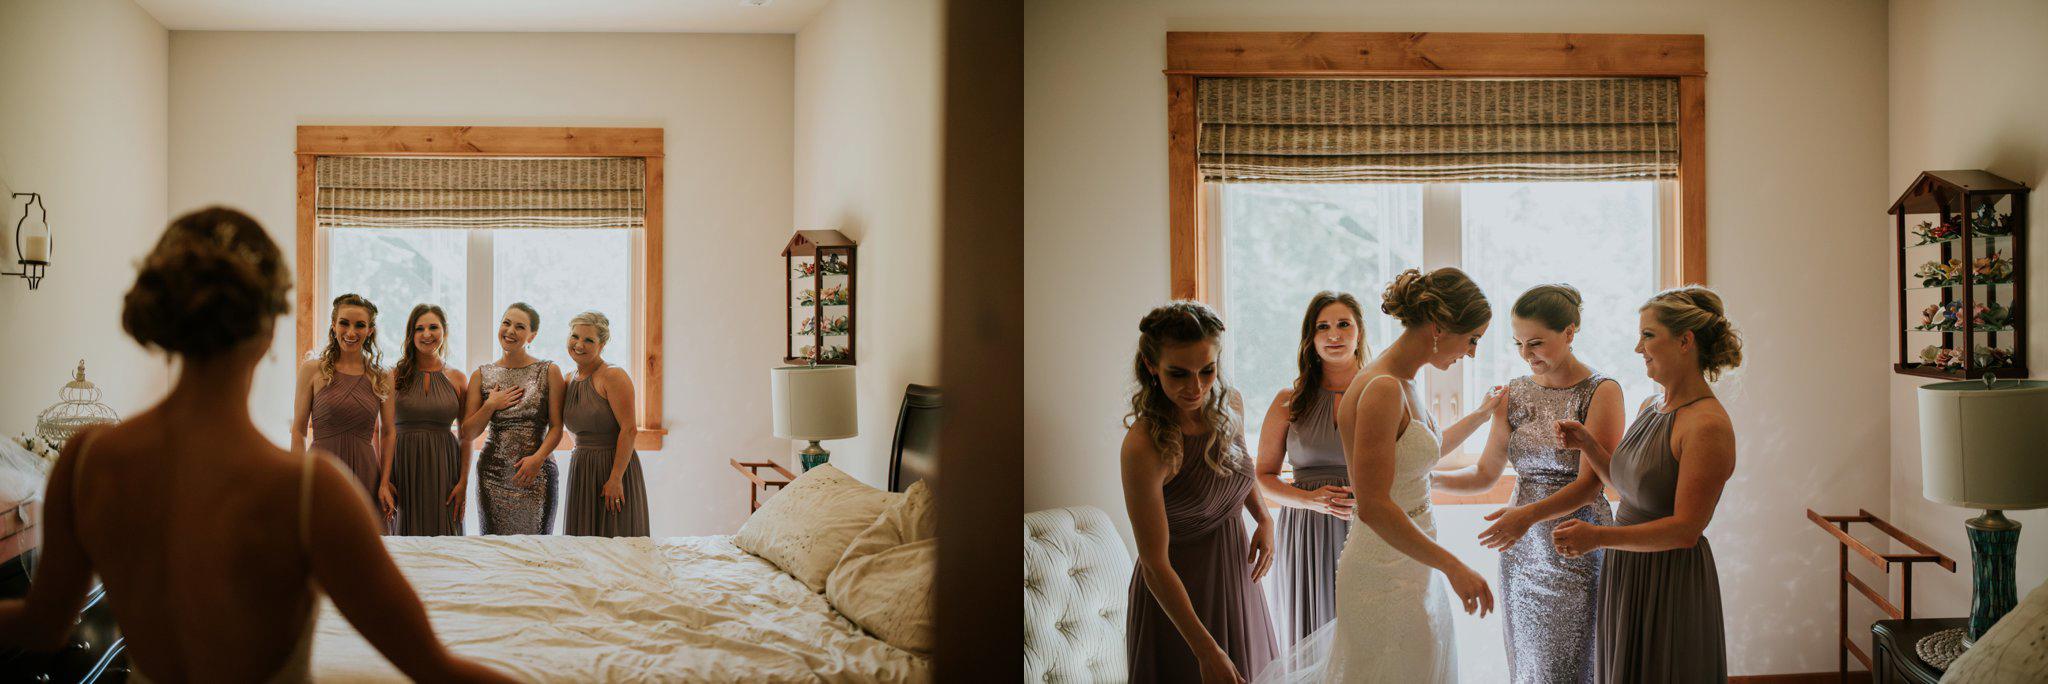 hollywood-school-house-wedding-seattle-photographer-caitlyn-nikula-26.jpg